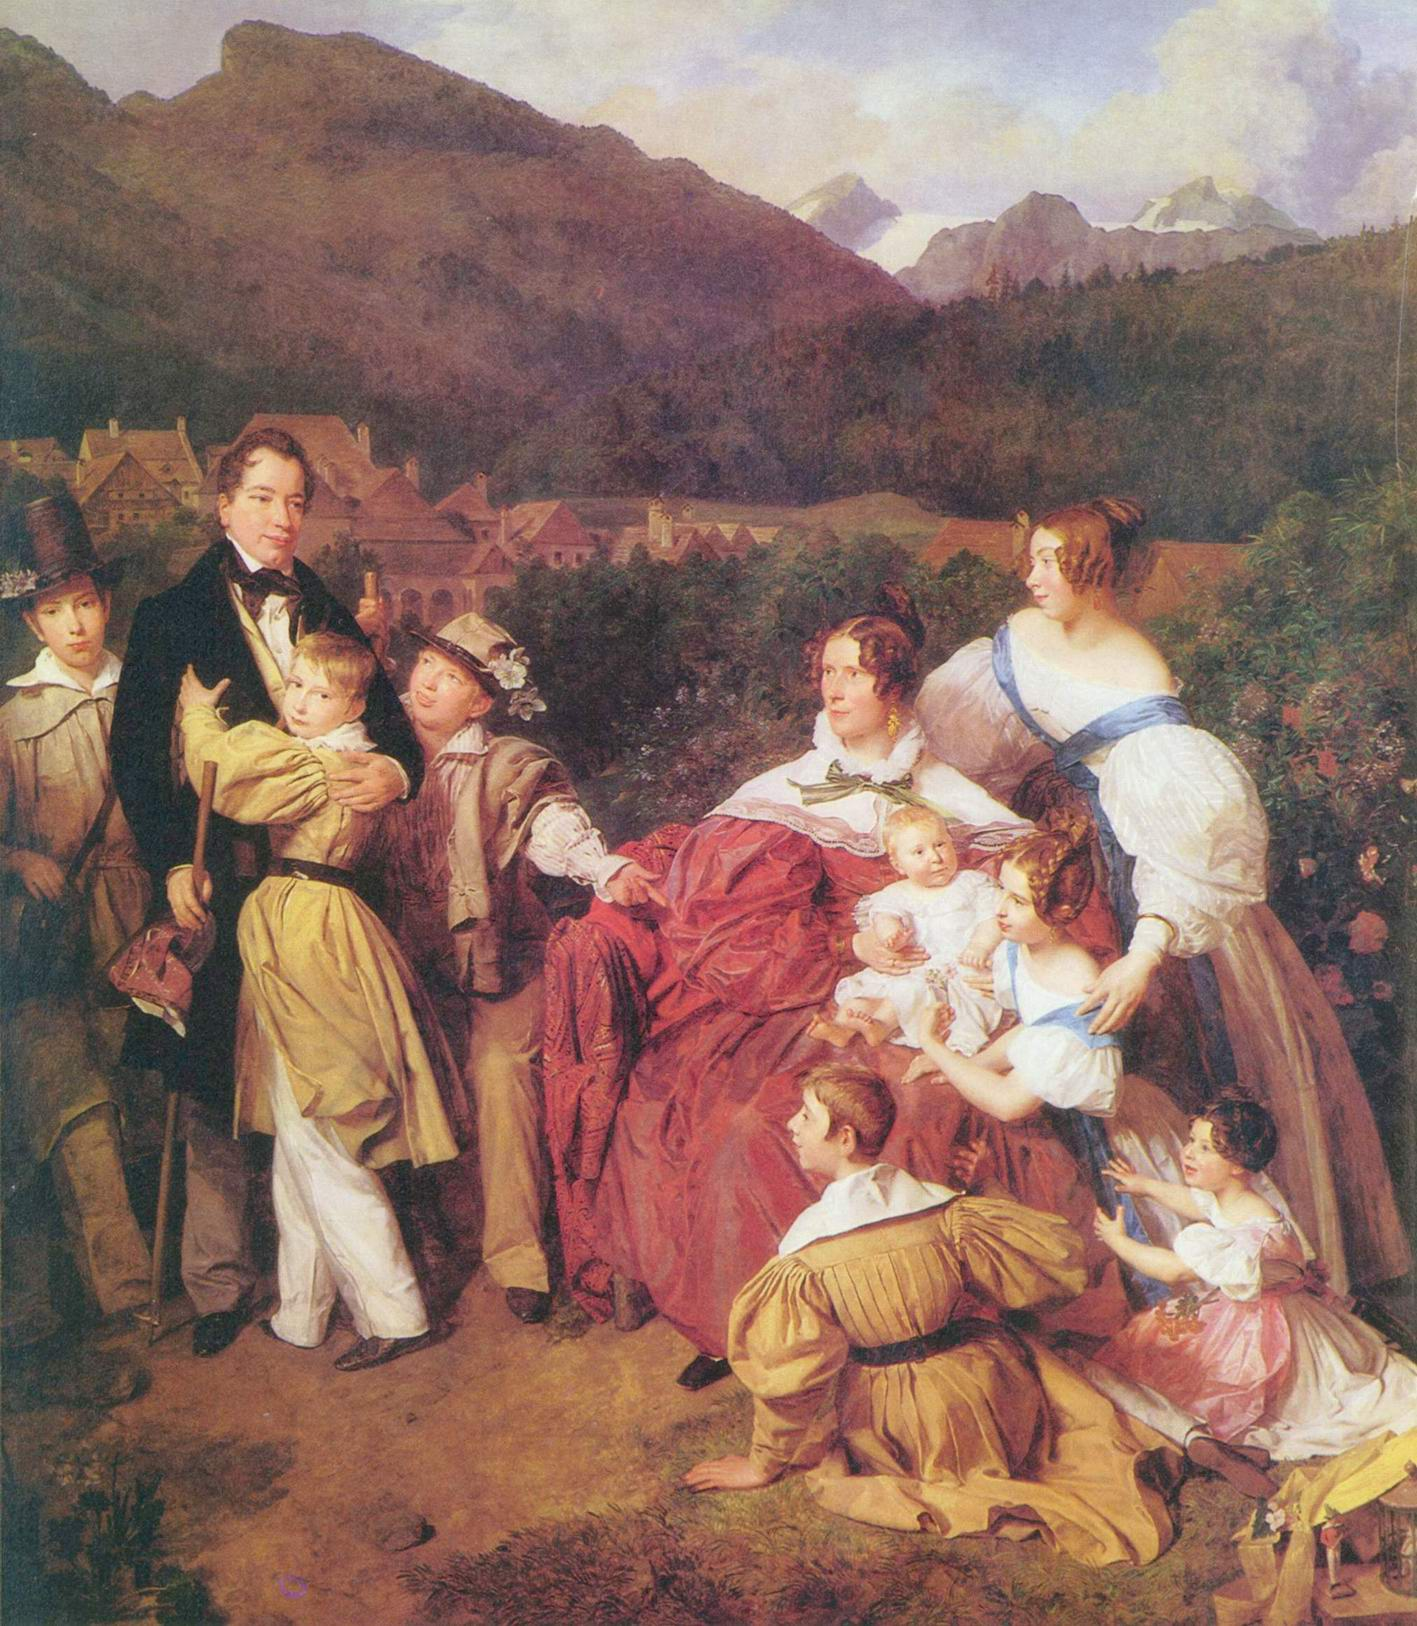 Семейство нотариуса д-ра Йозефа Августа Эльца, Вальдмюллер Фердинанд Георг